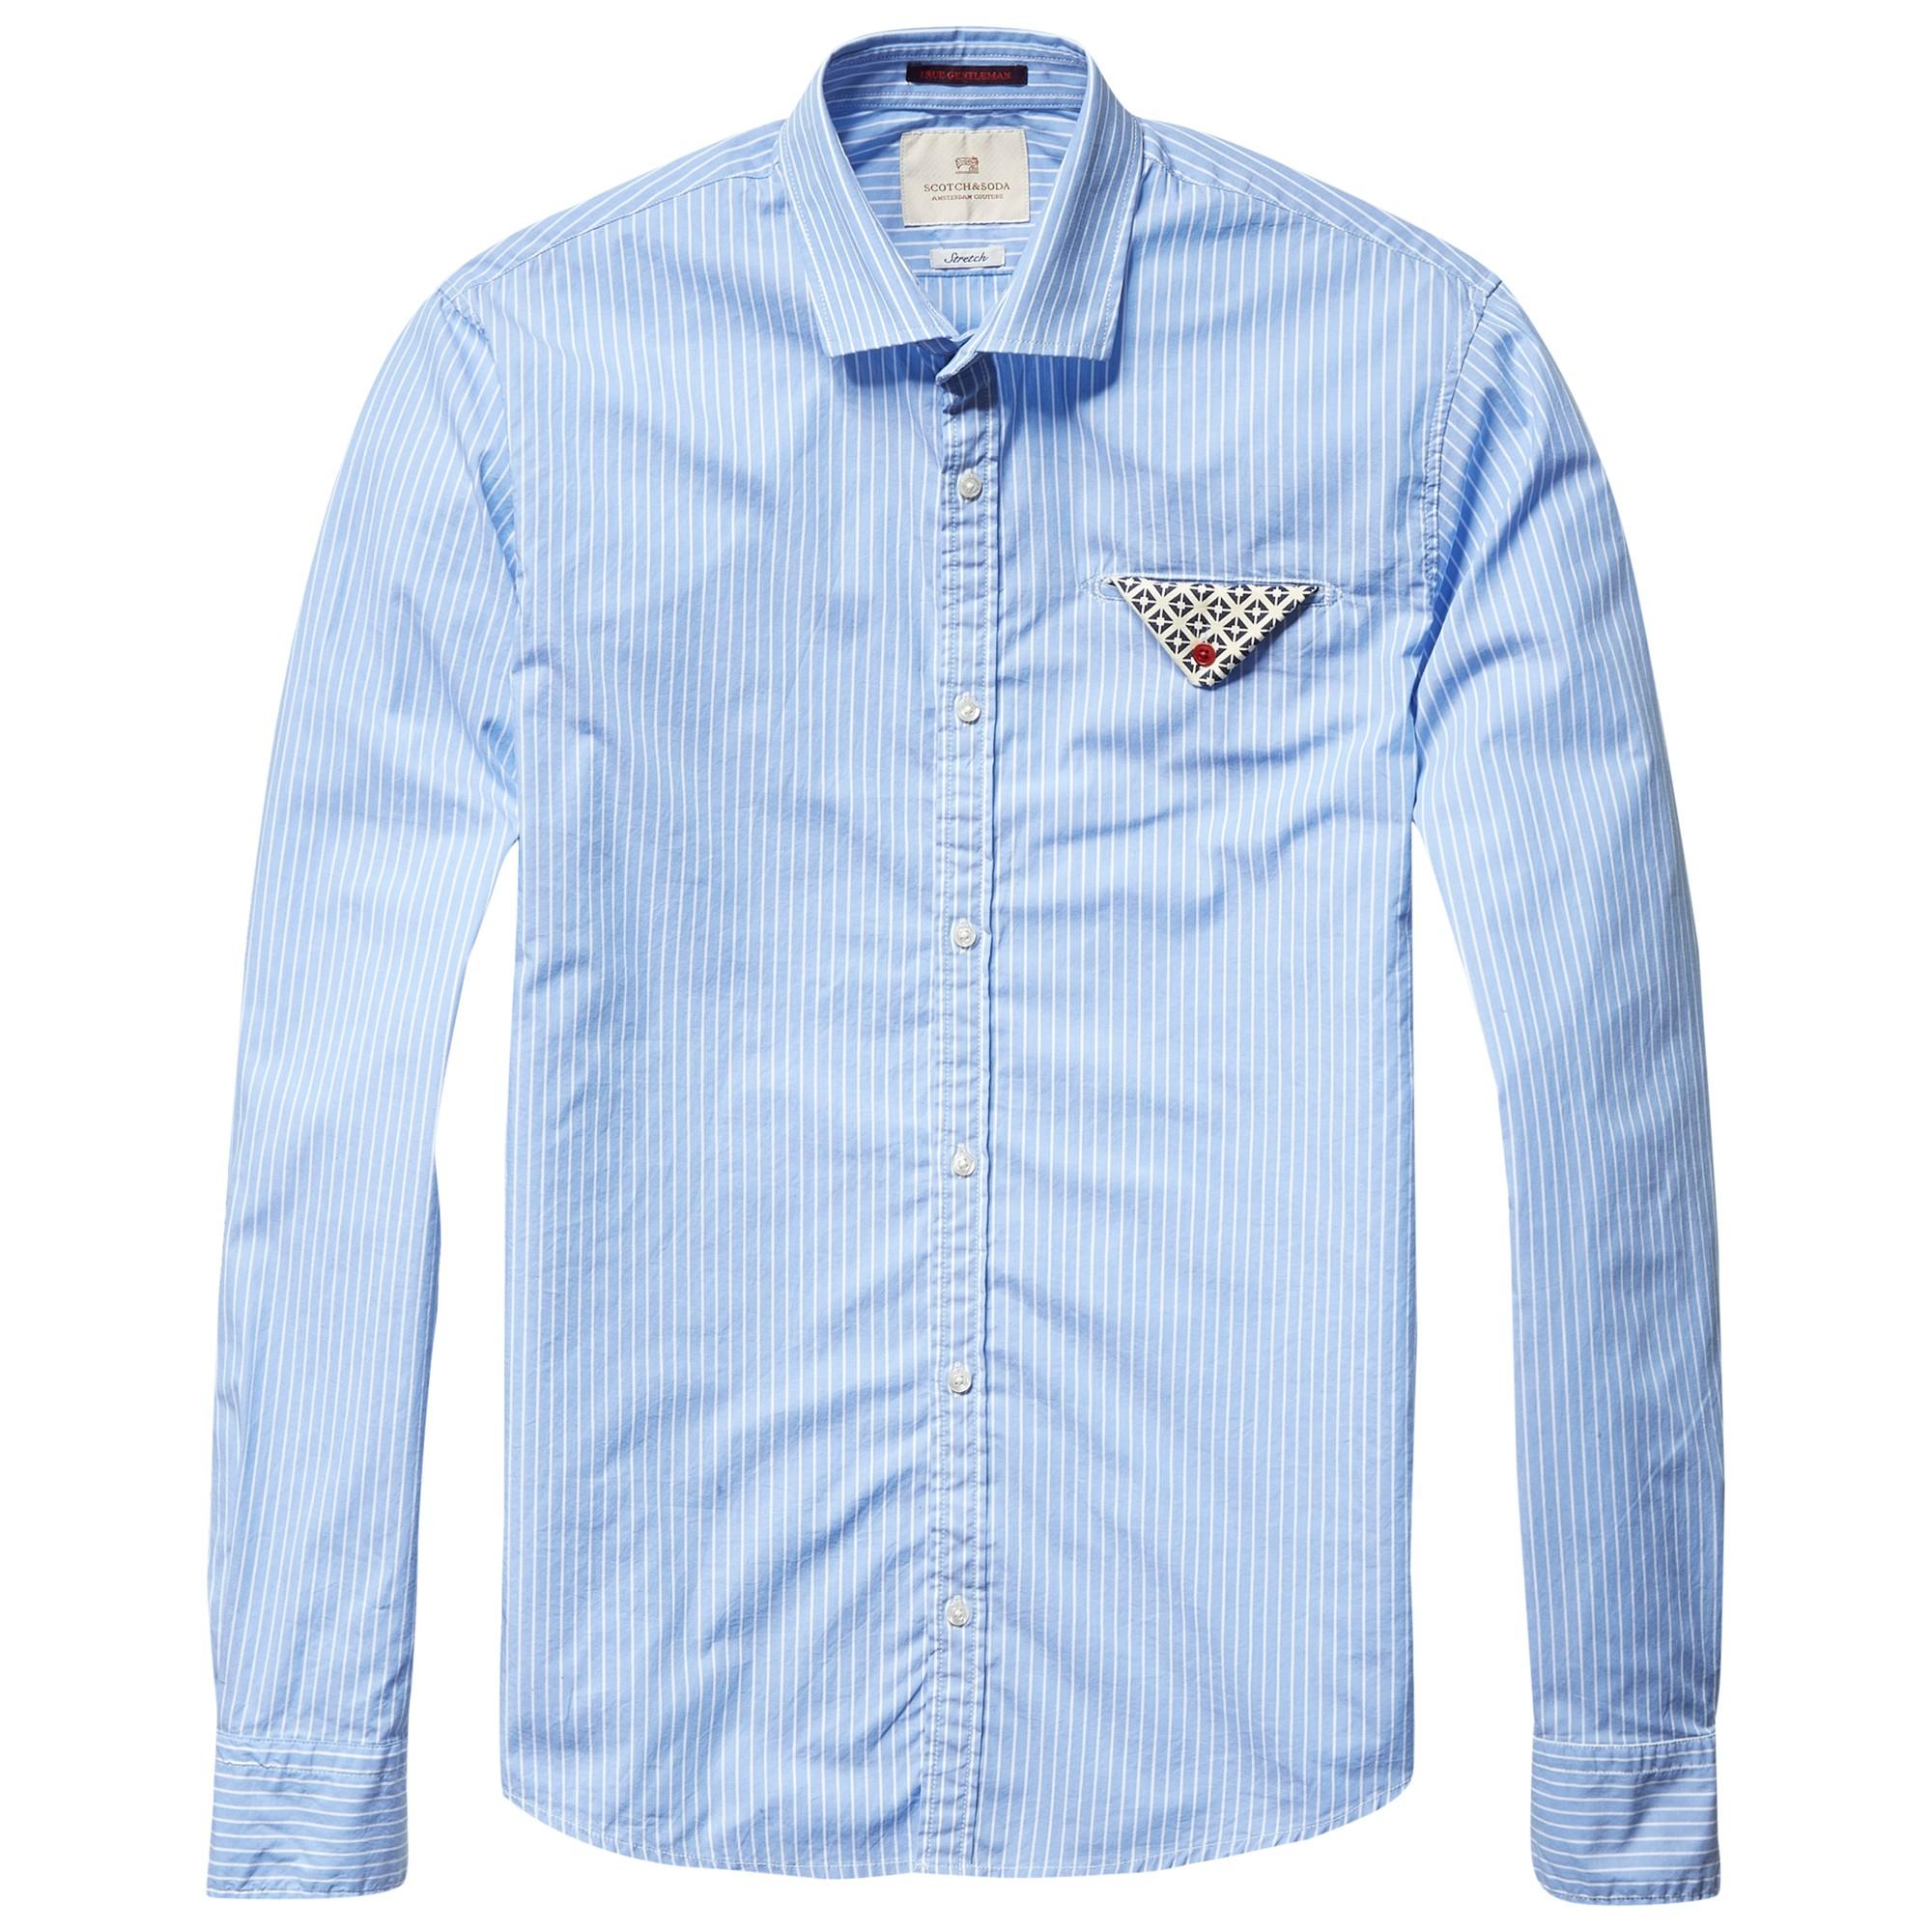 90ed25984e Scotch & Soda Contrast Fold Pocket Shirt in Blue for Men - Lyst